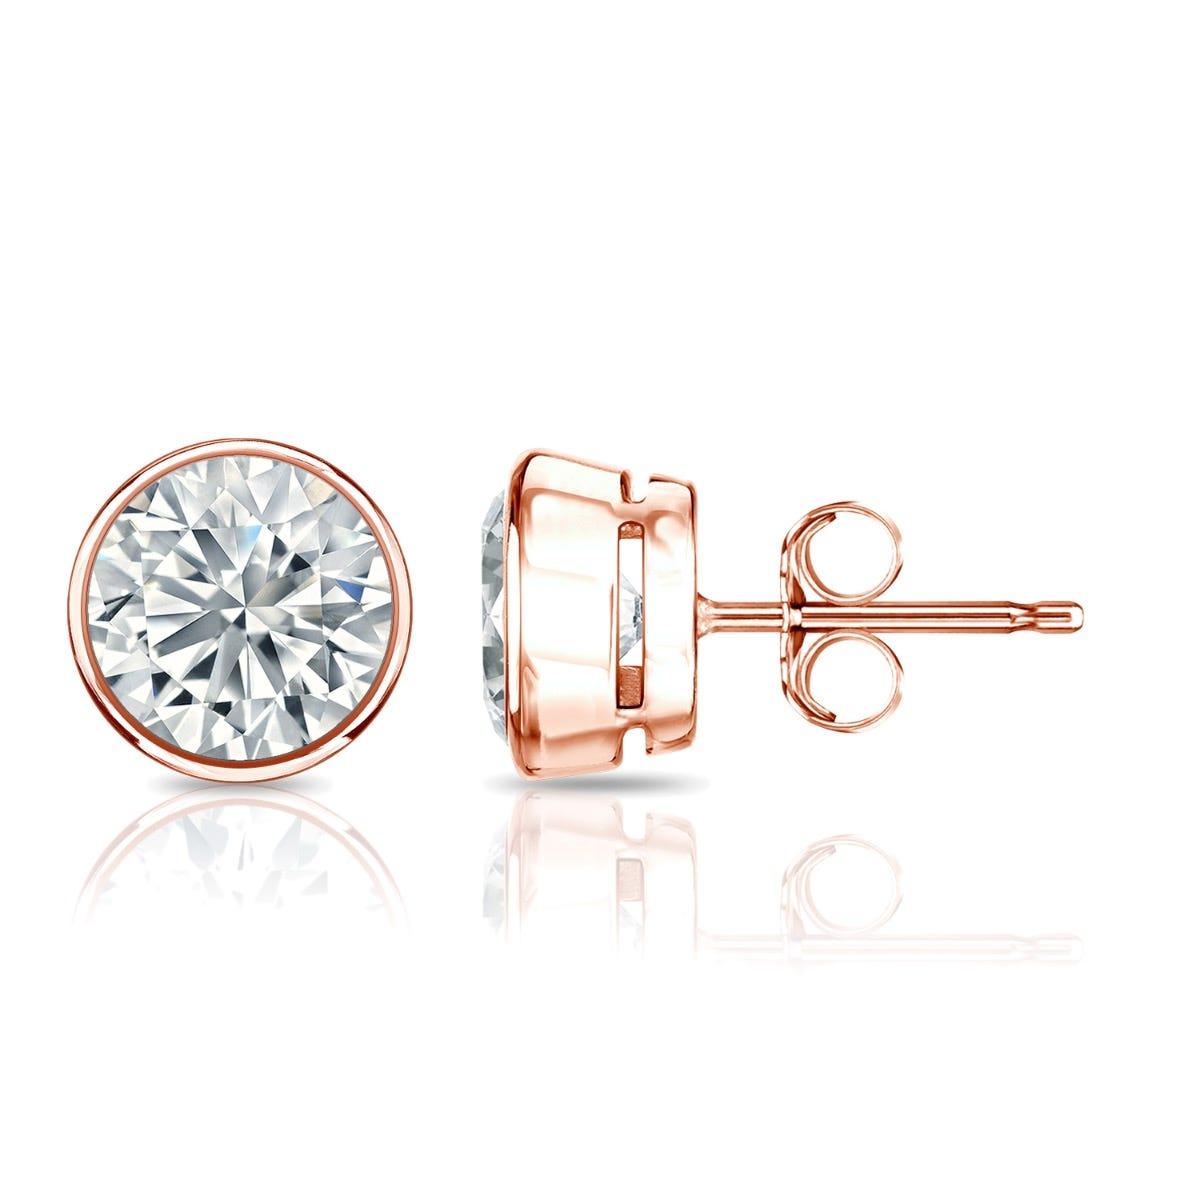 Diamond Round Bezel-Set 1-1/2ctw. Solitaire Stud (IJ-VS2) Earrings in 14K Rose Gold